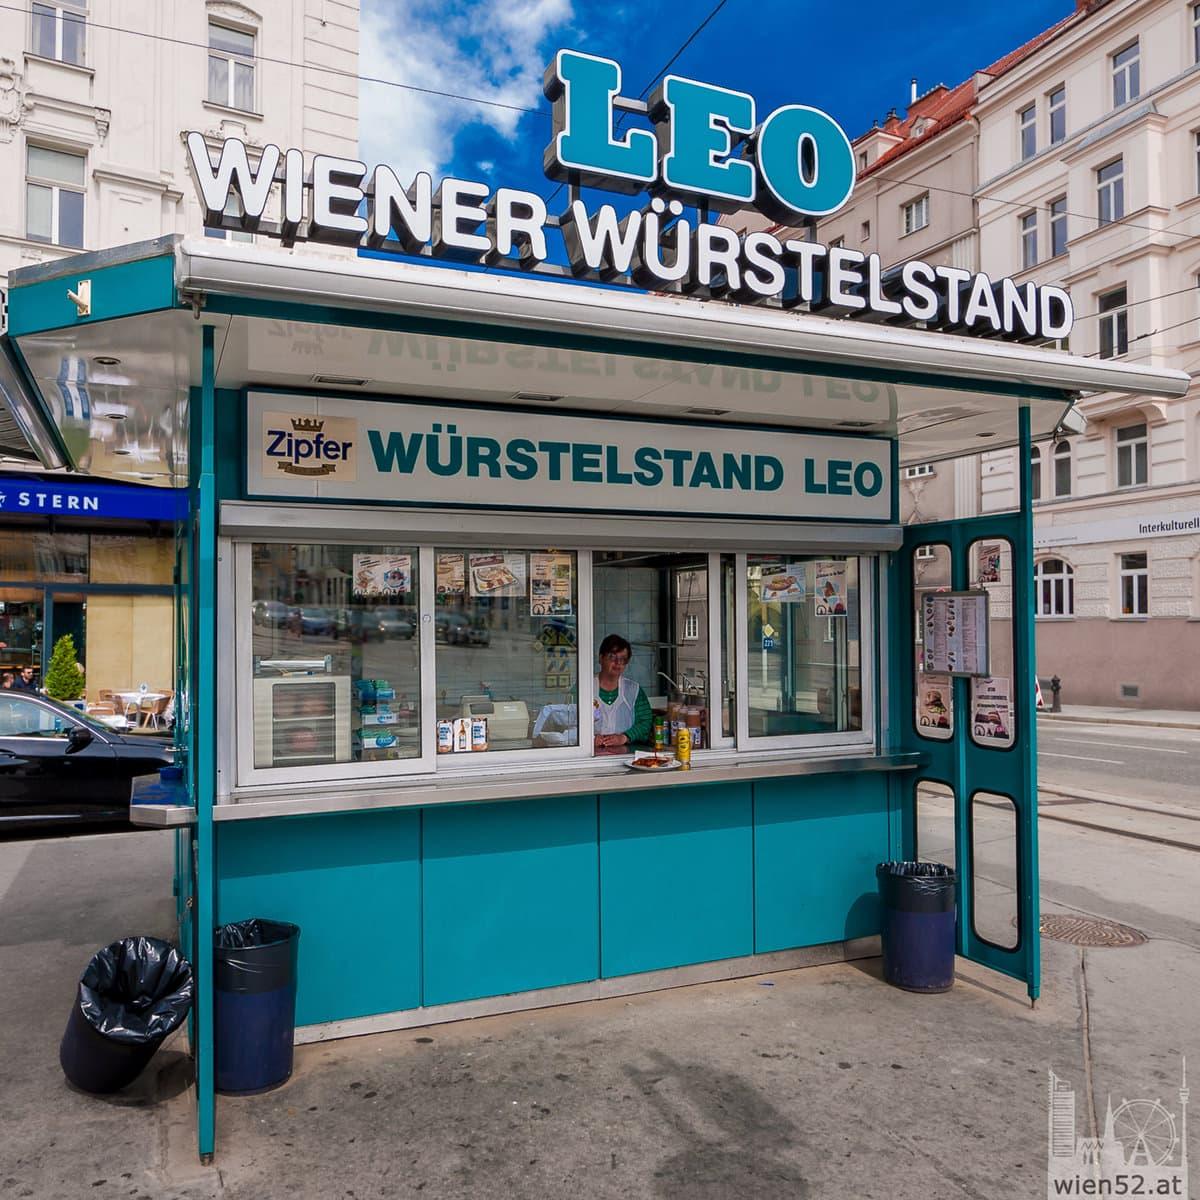 Wiens ältester Würstelstand - Leo